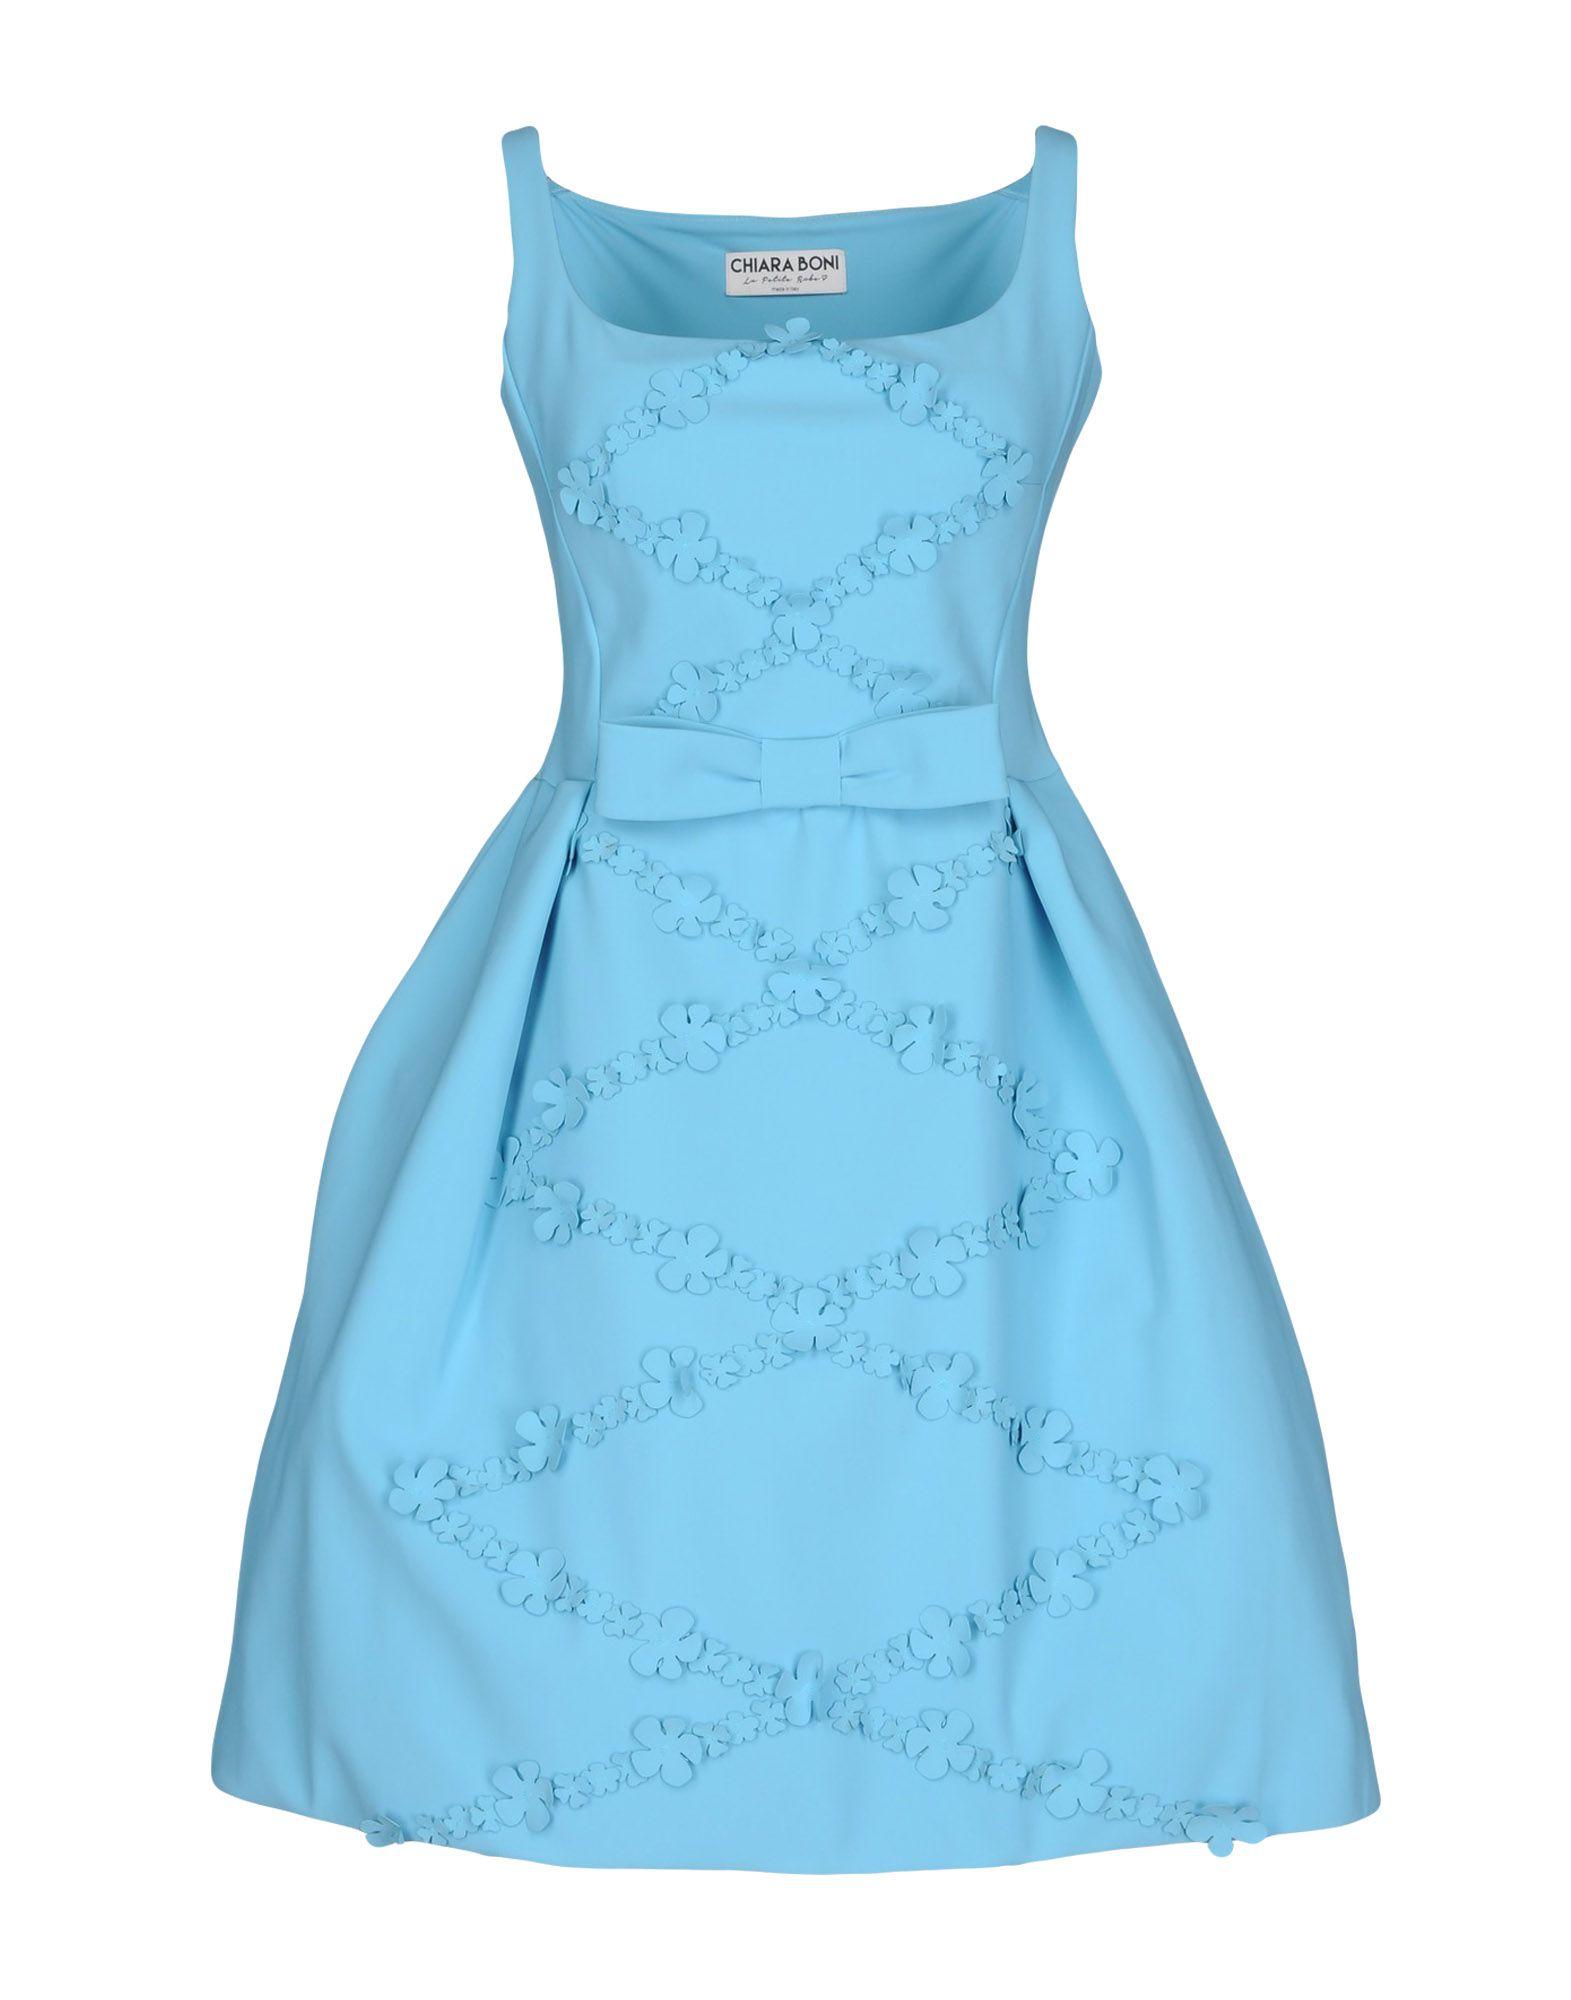 CHIARA BONI LA PETITE ROBE Платье до колена бюстгальтер 3 штуки quelle petite fleur 569484